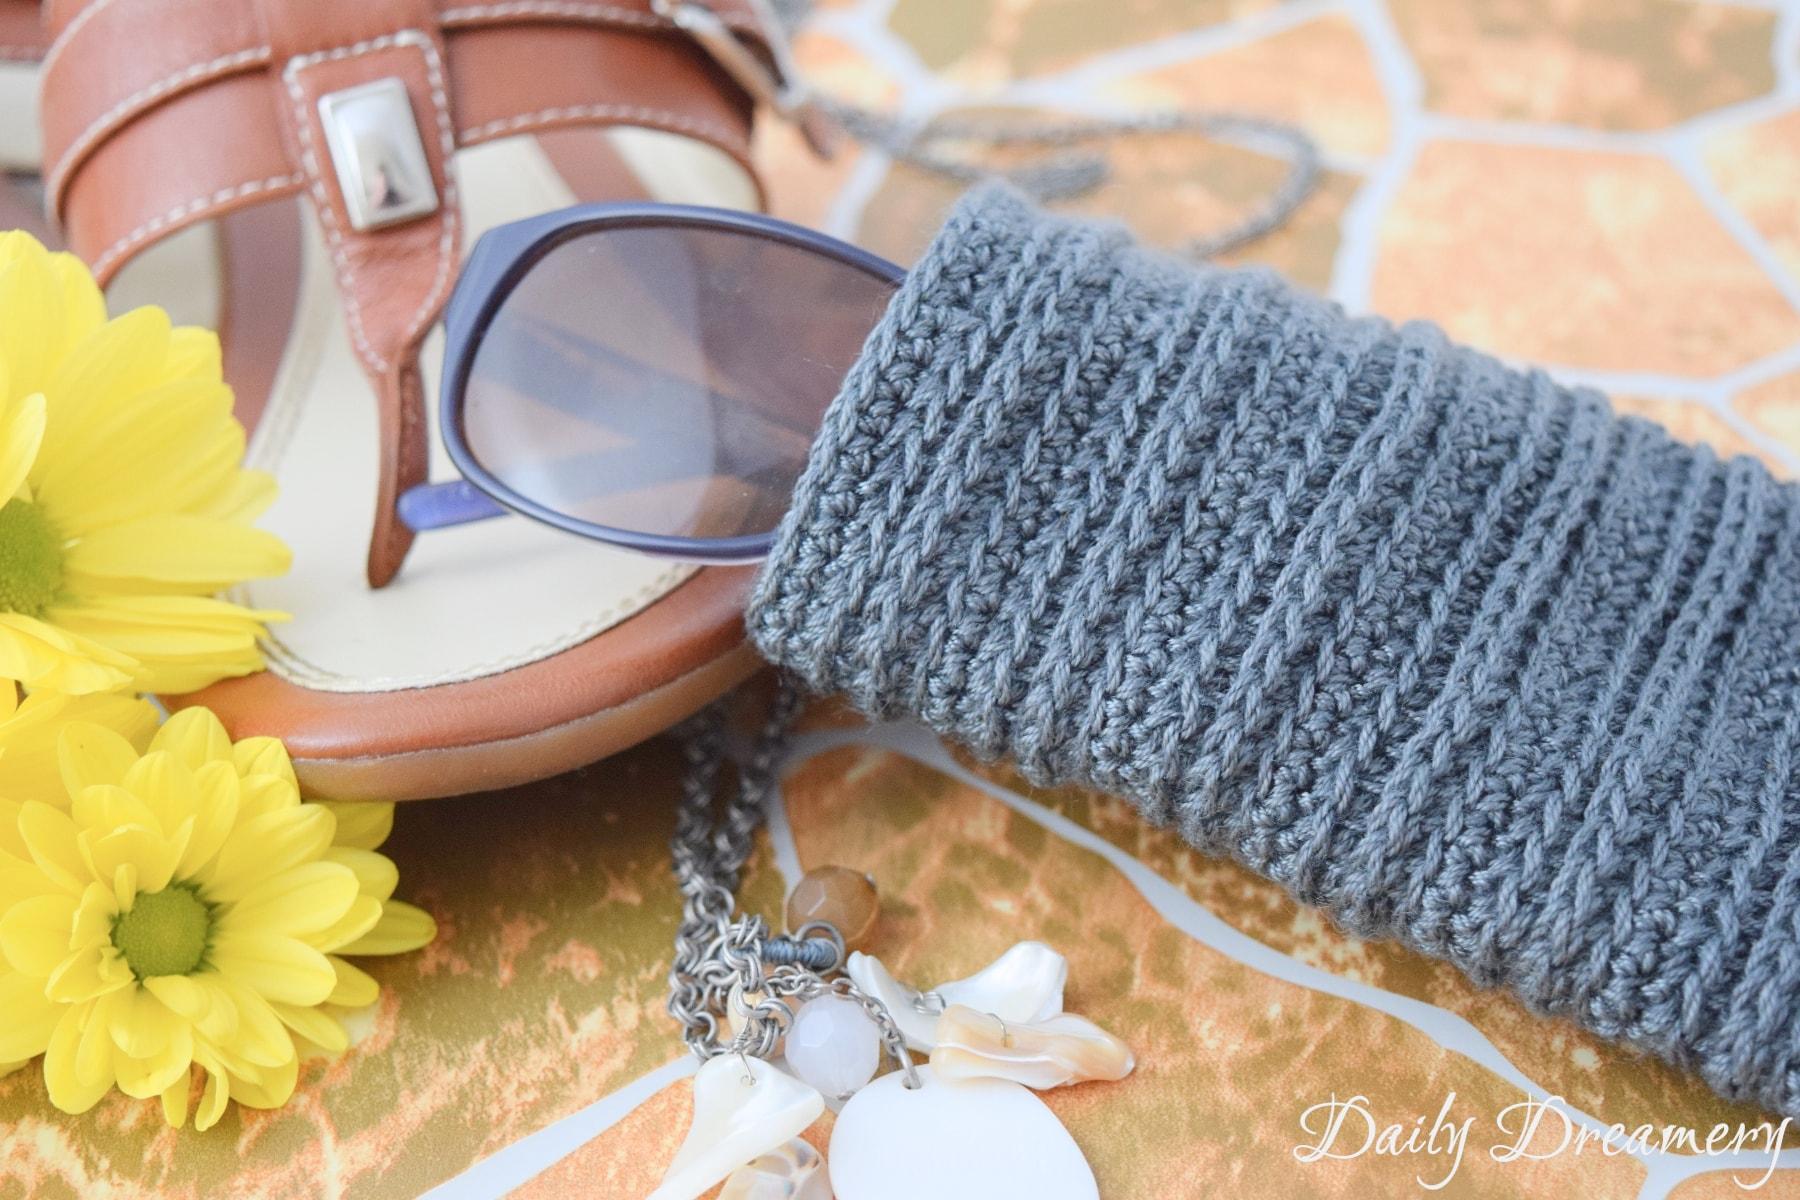 Sonnenbrillenschutzhülle häkeln